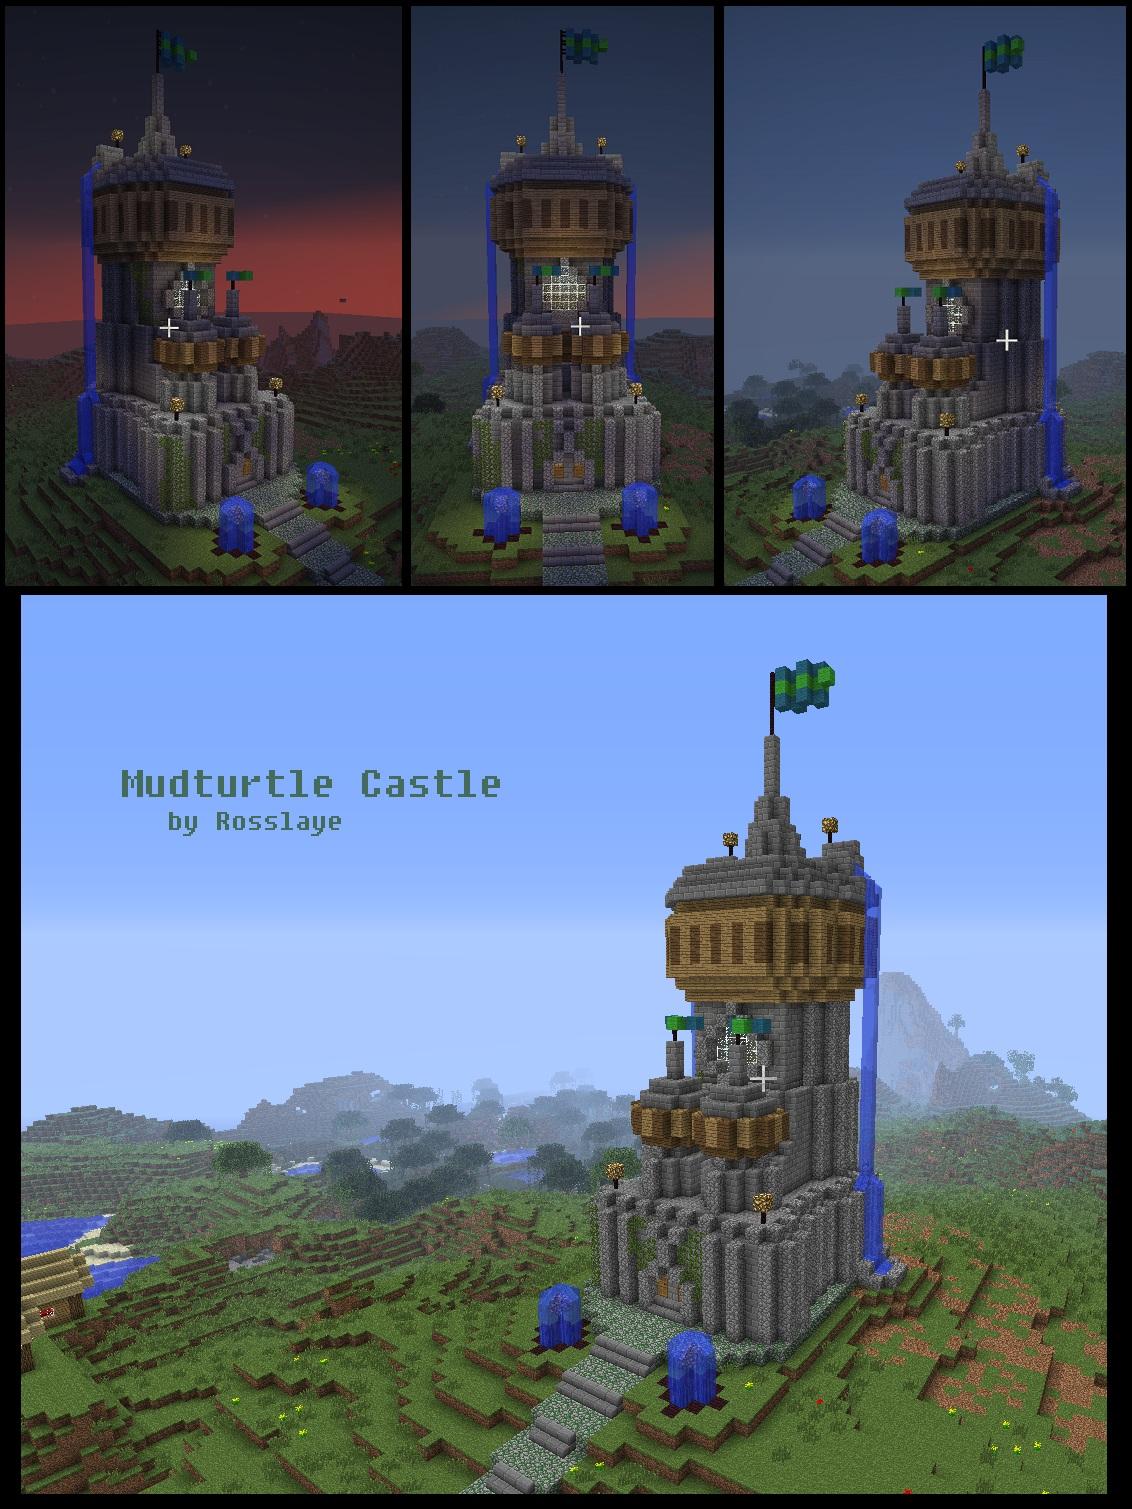 Mudturtle castle minecraft architecture by rosslaye on deviantart - Minecraft and architecture ...